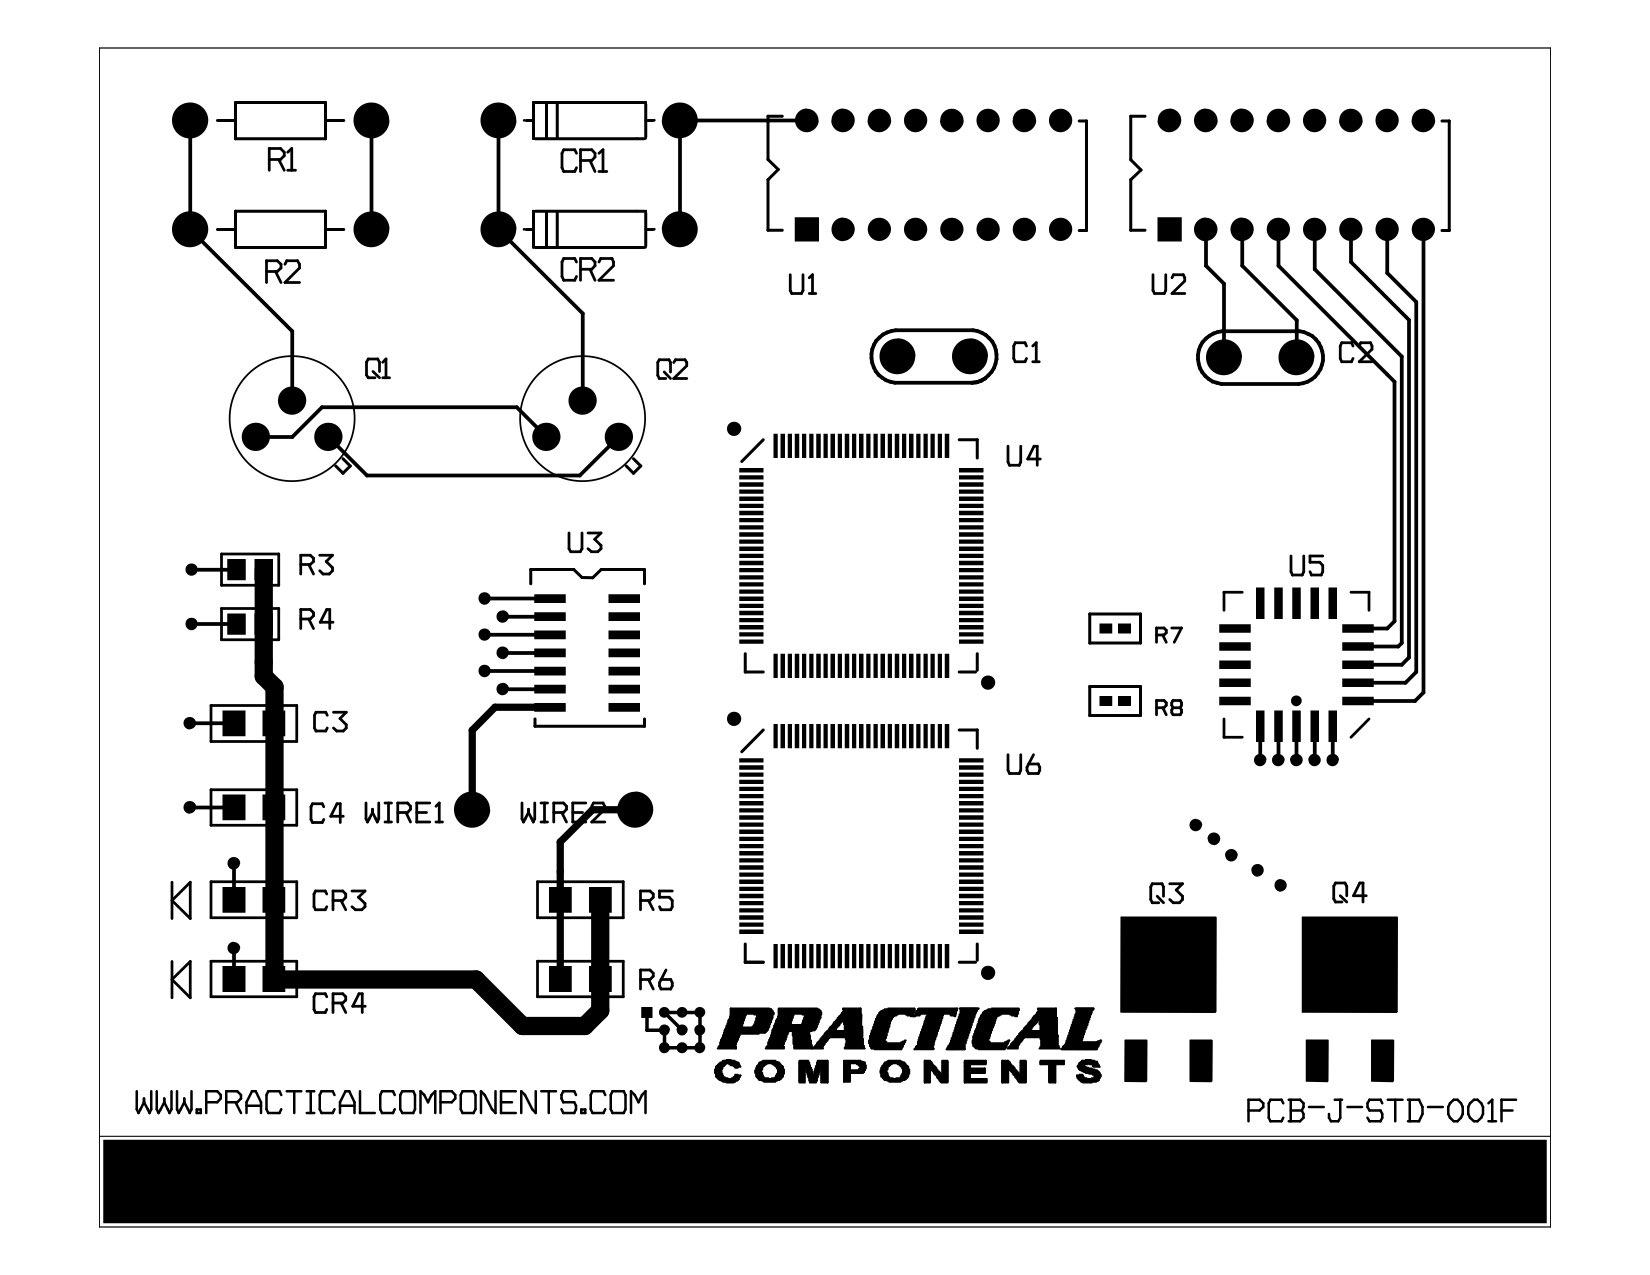 PC016-IPC 001 J-STD-REV F/G Solder Training Kit